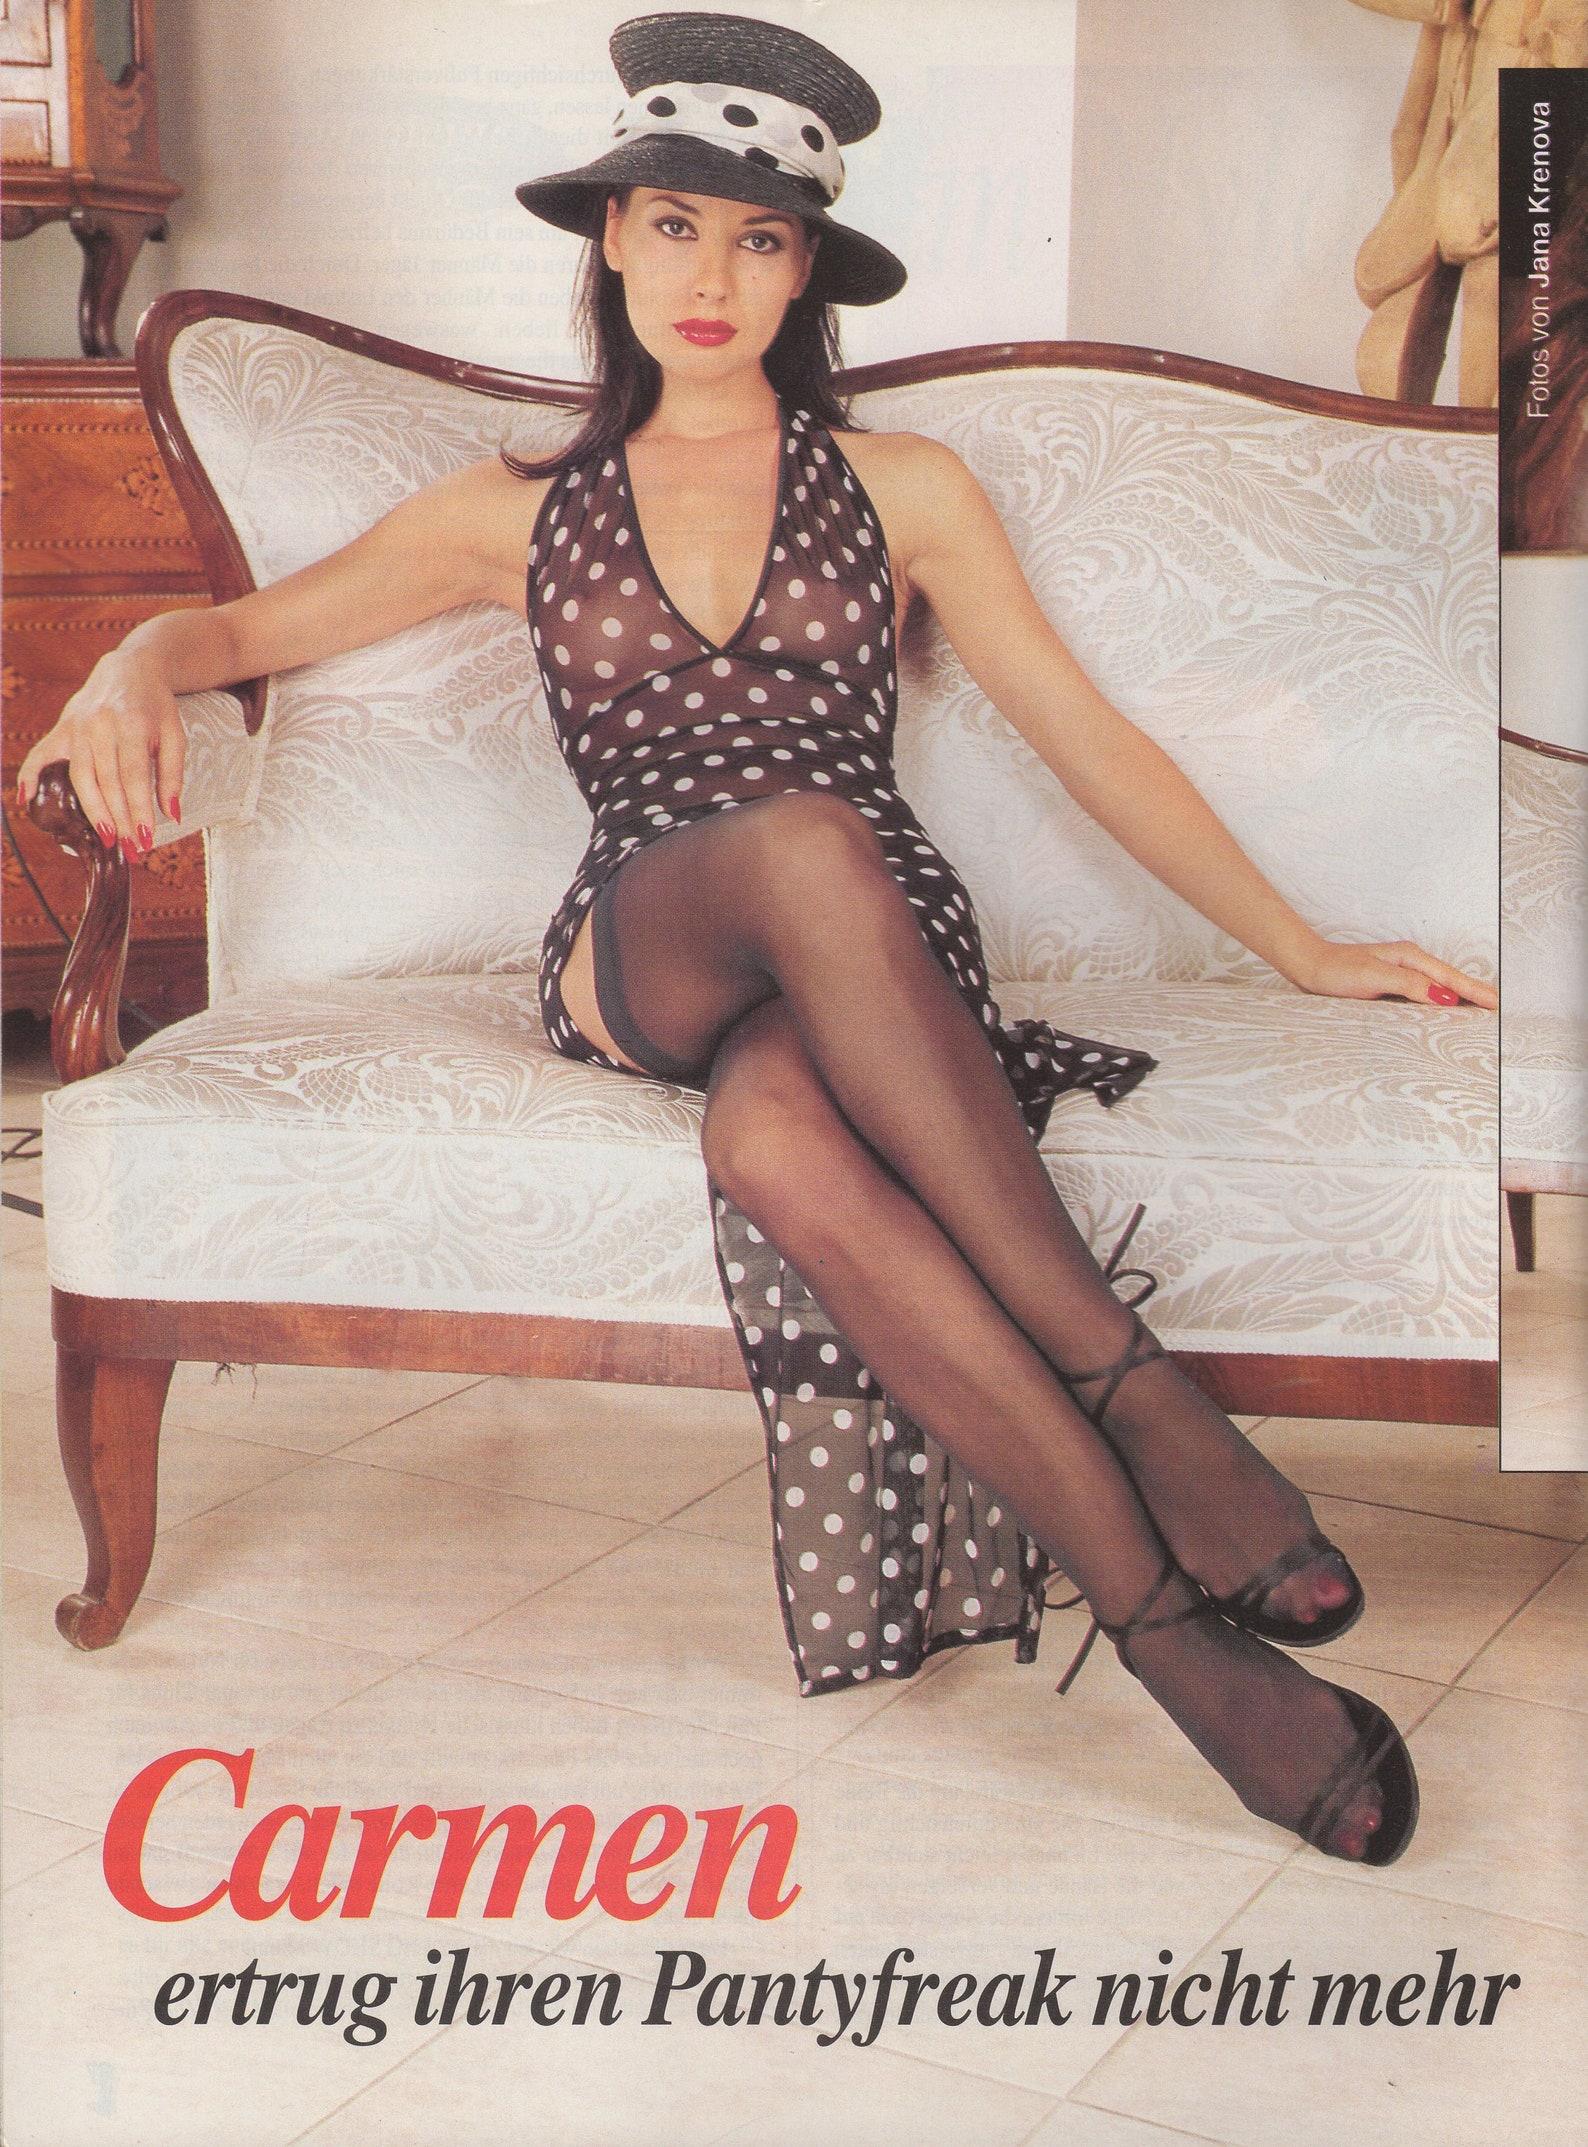 LEG SHOW Magazin Nr. 42 2000 / German Edition / Erotik Akt